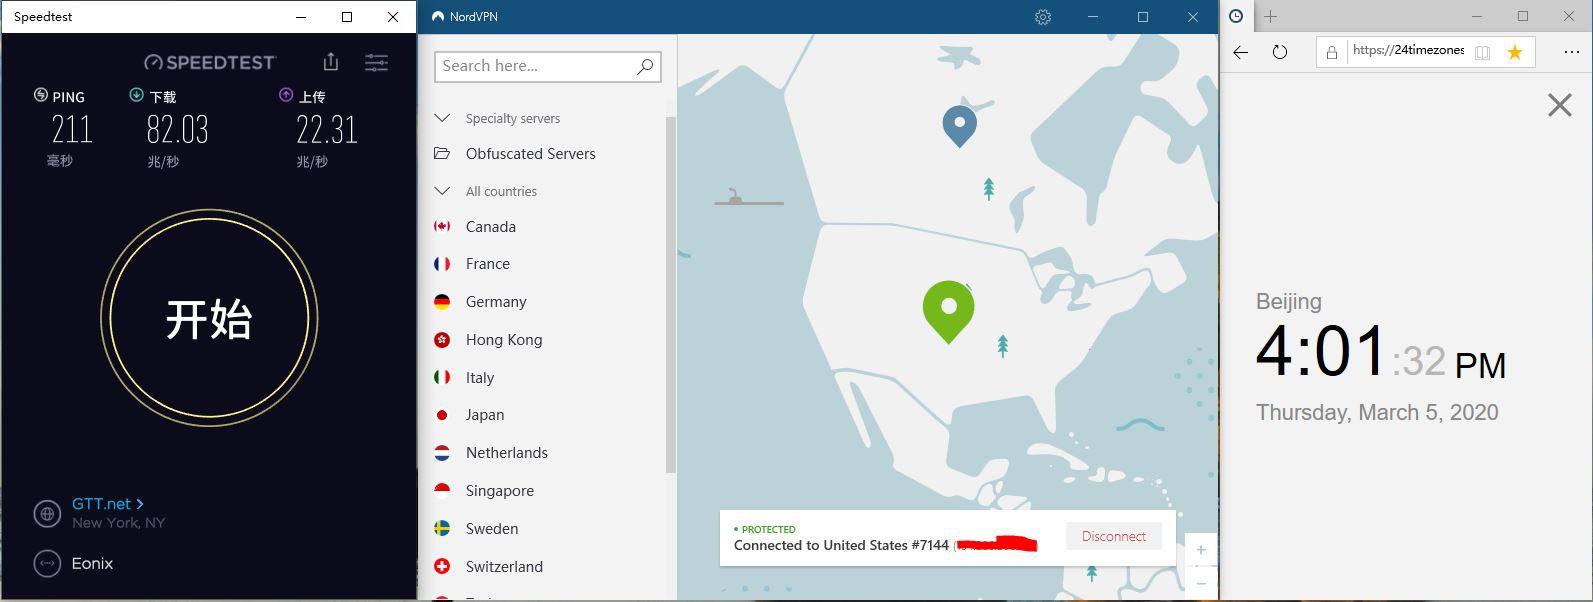 Windows10 NordVPN USA #7144 中国VPN翻墙 科学上网 SpeedTest测速 - 20200305